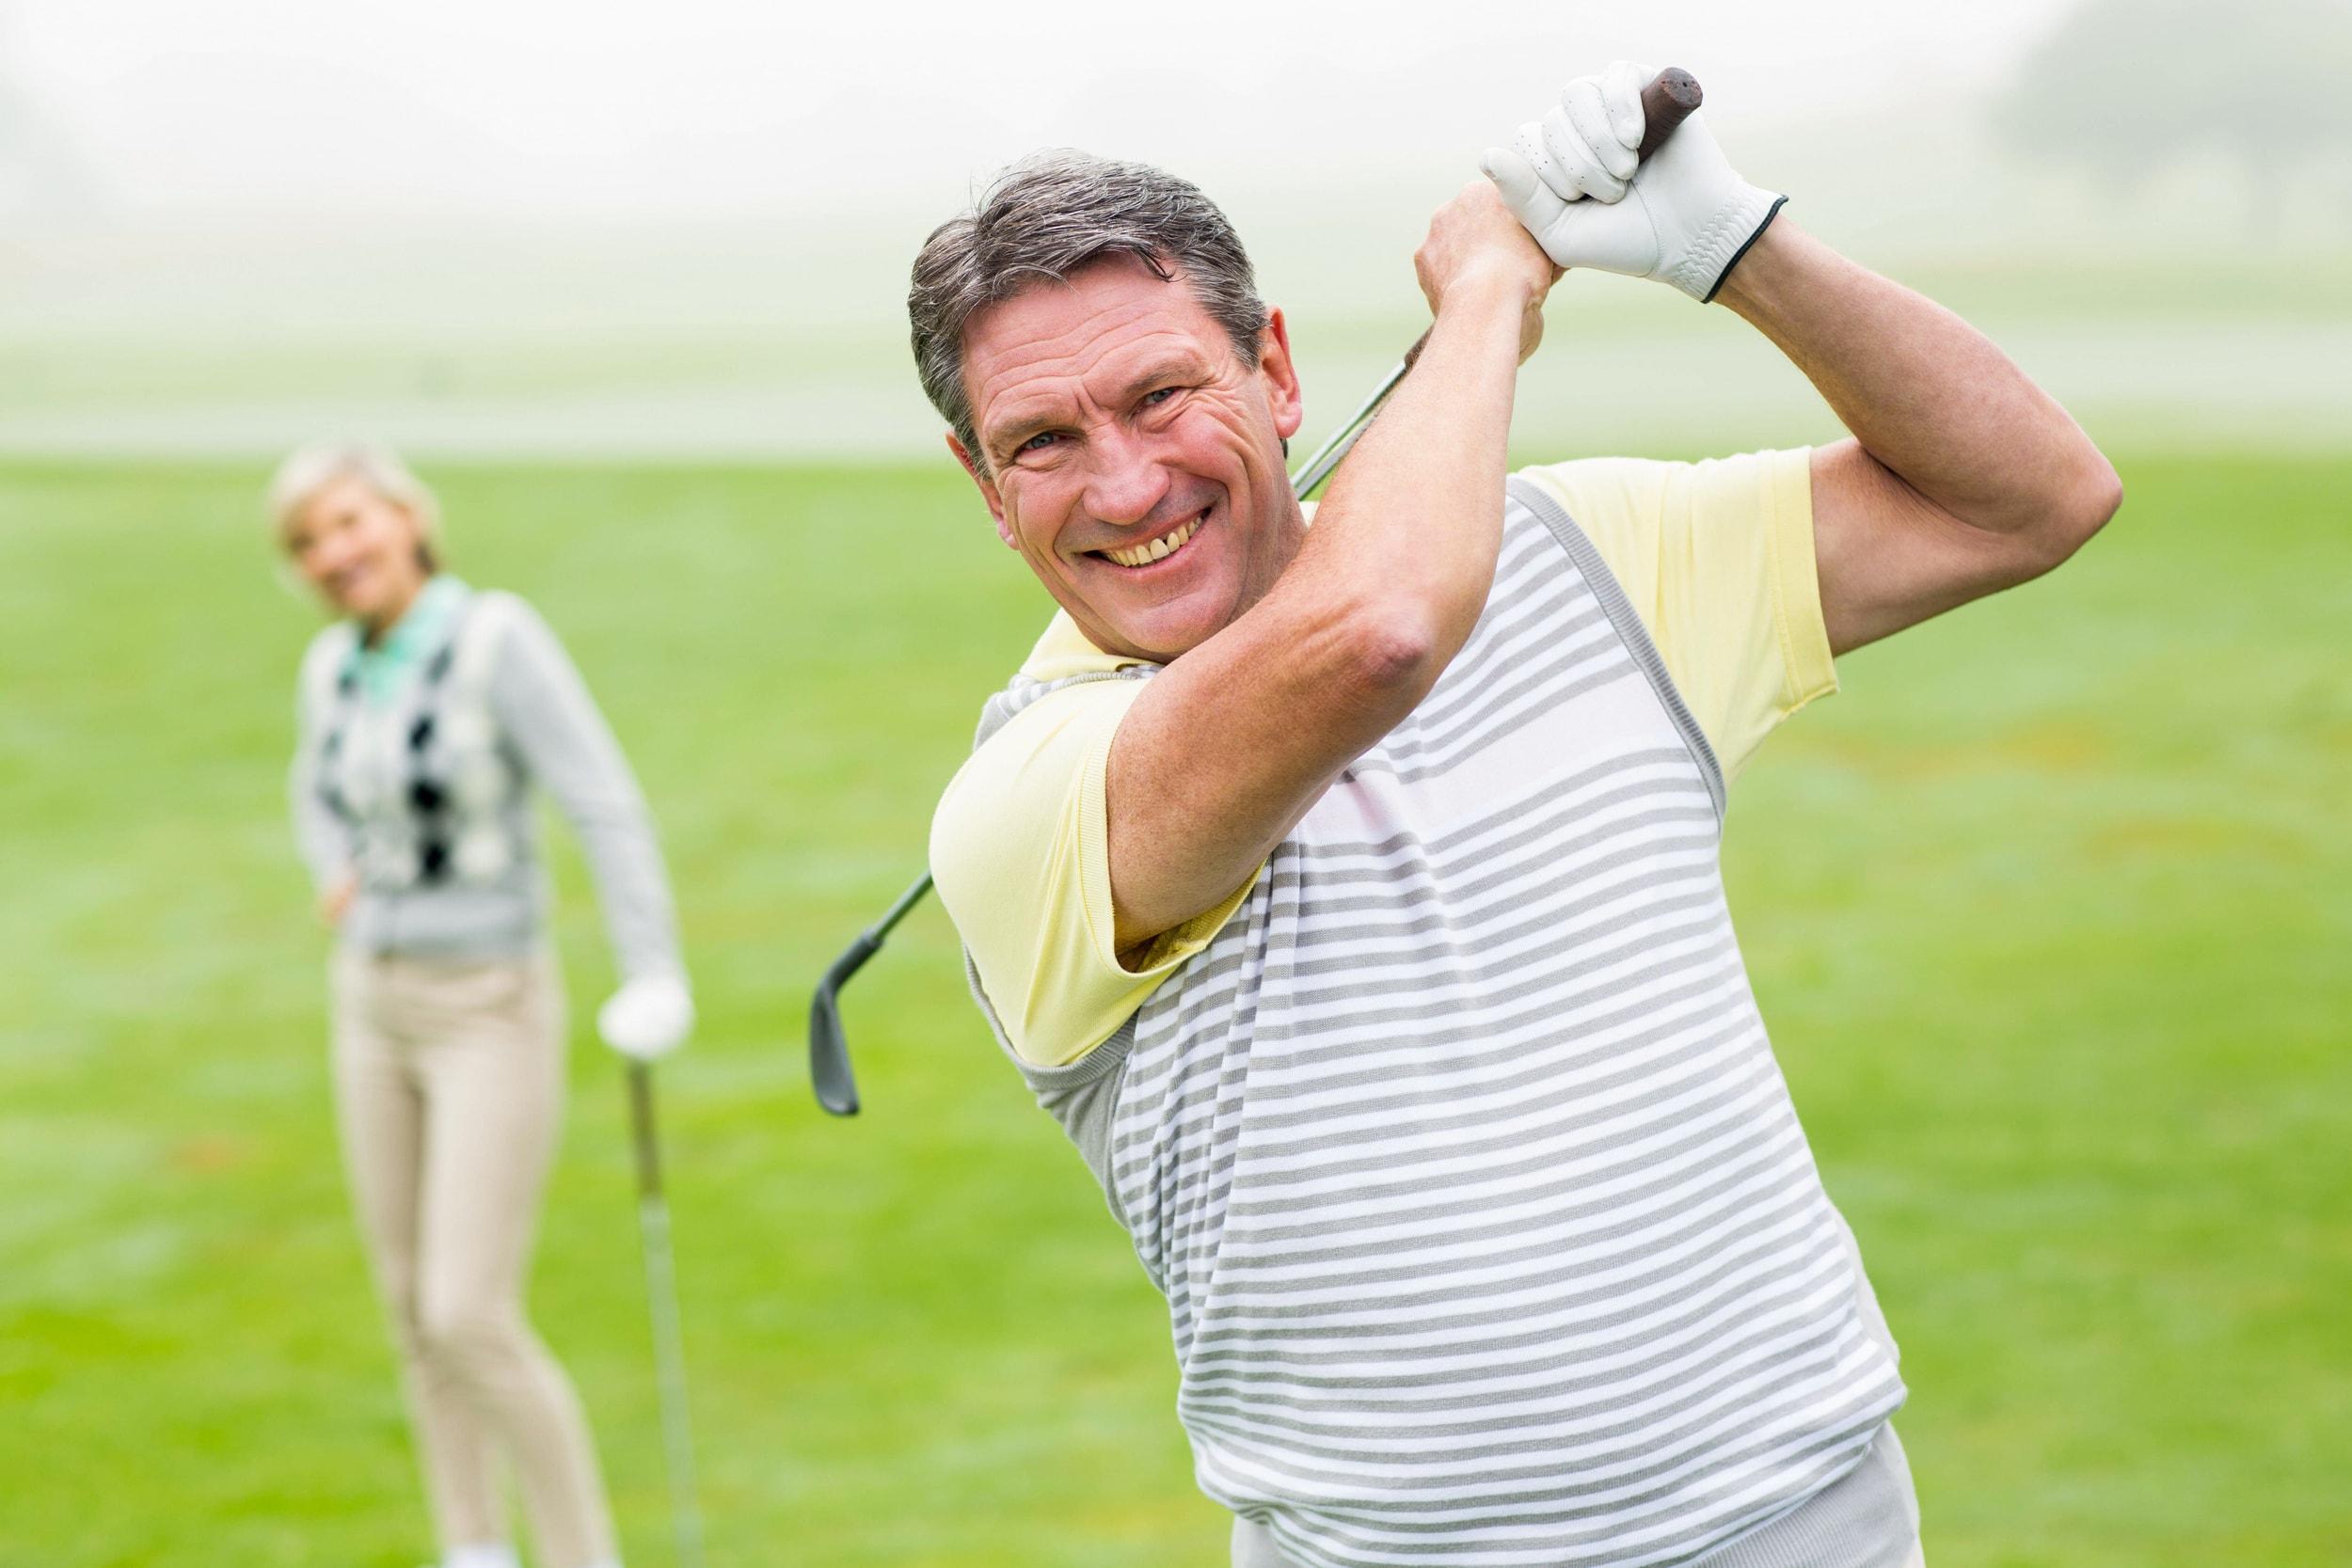 Golf 2 homepage